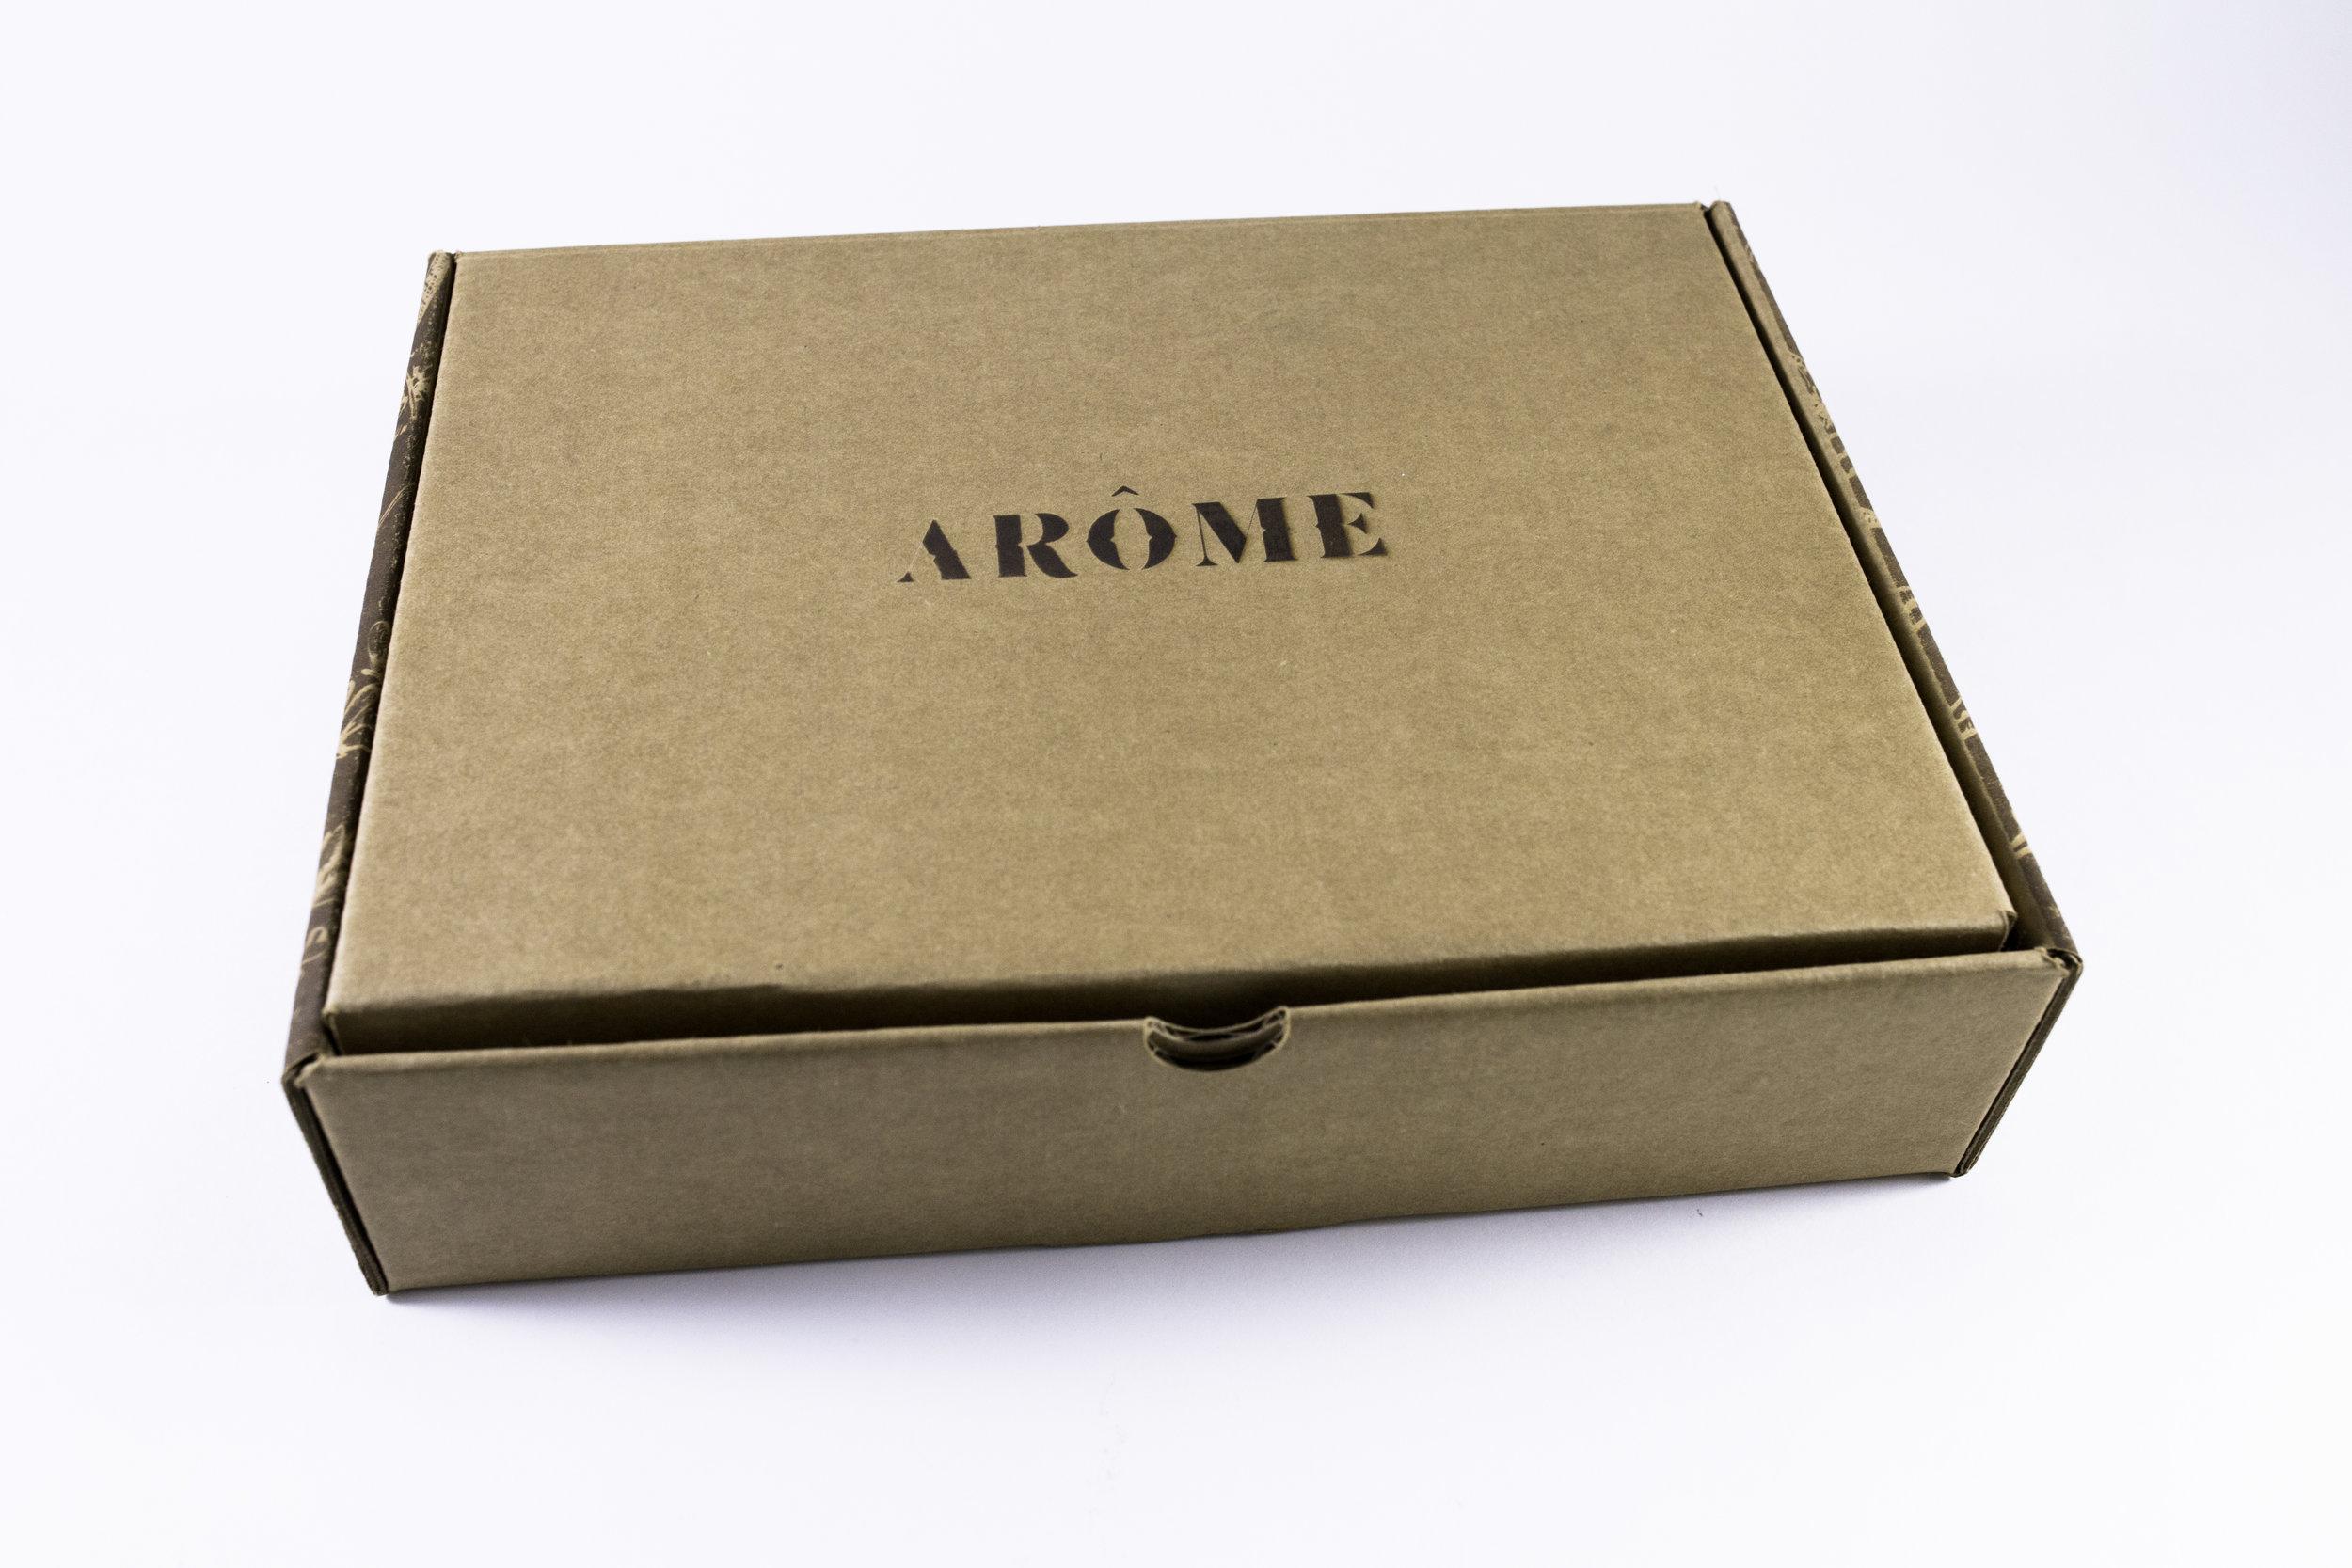 02_hrs_Arome.jpg